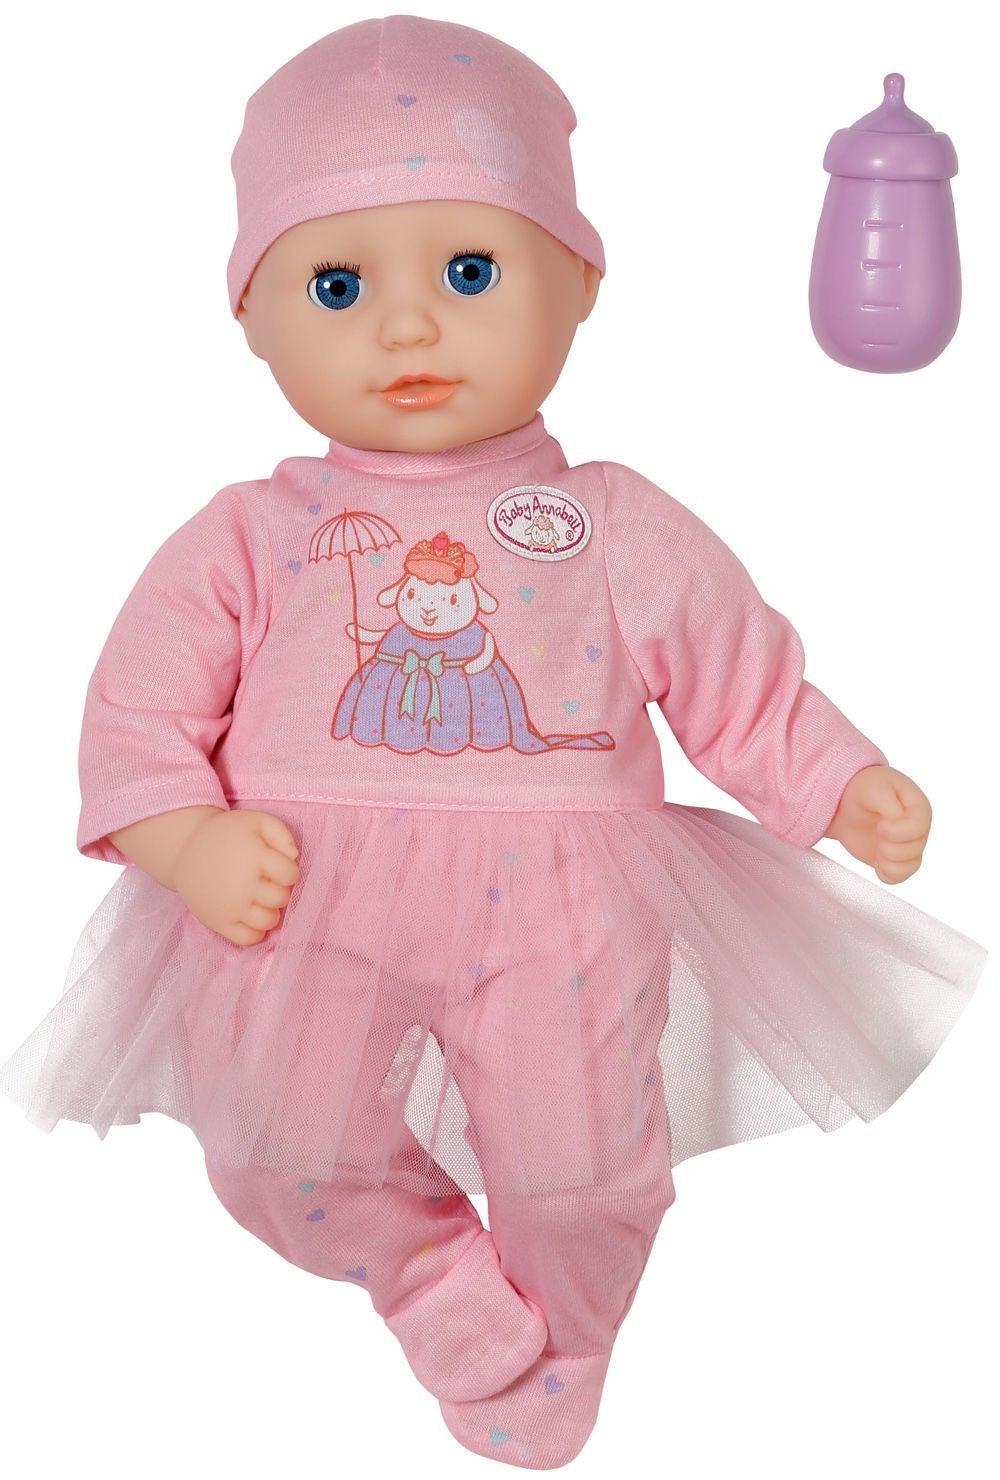 Baby Annabell Docka Little Sweet Annabell 36 Cm